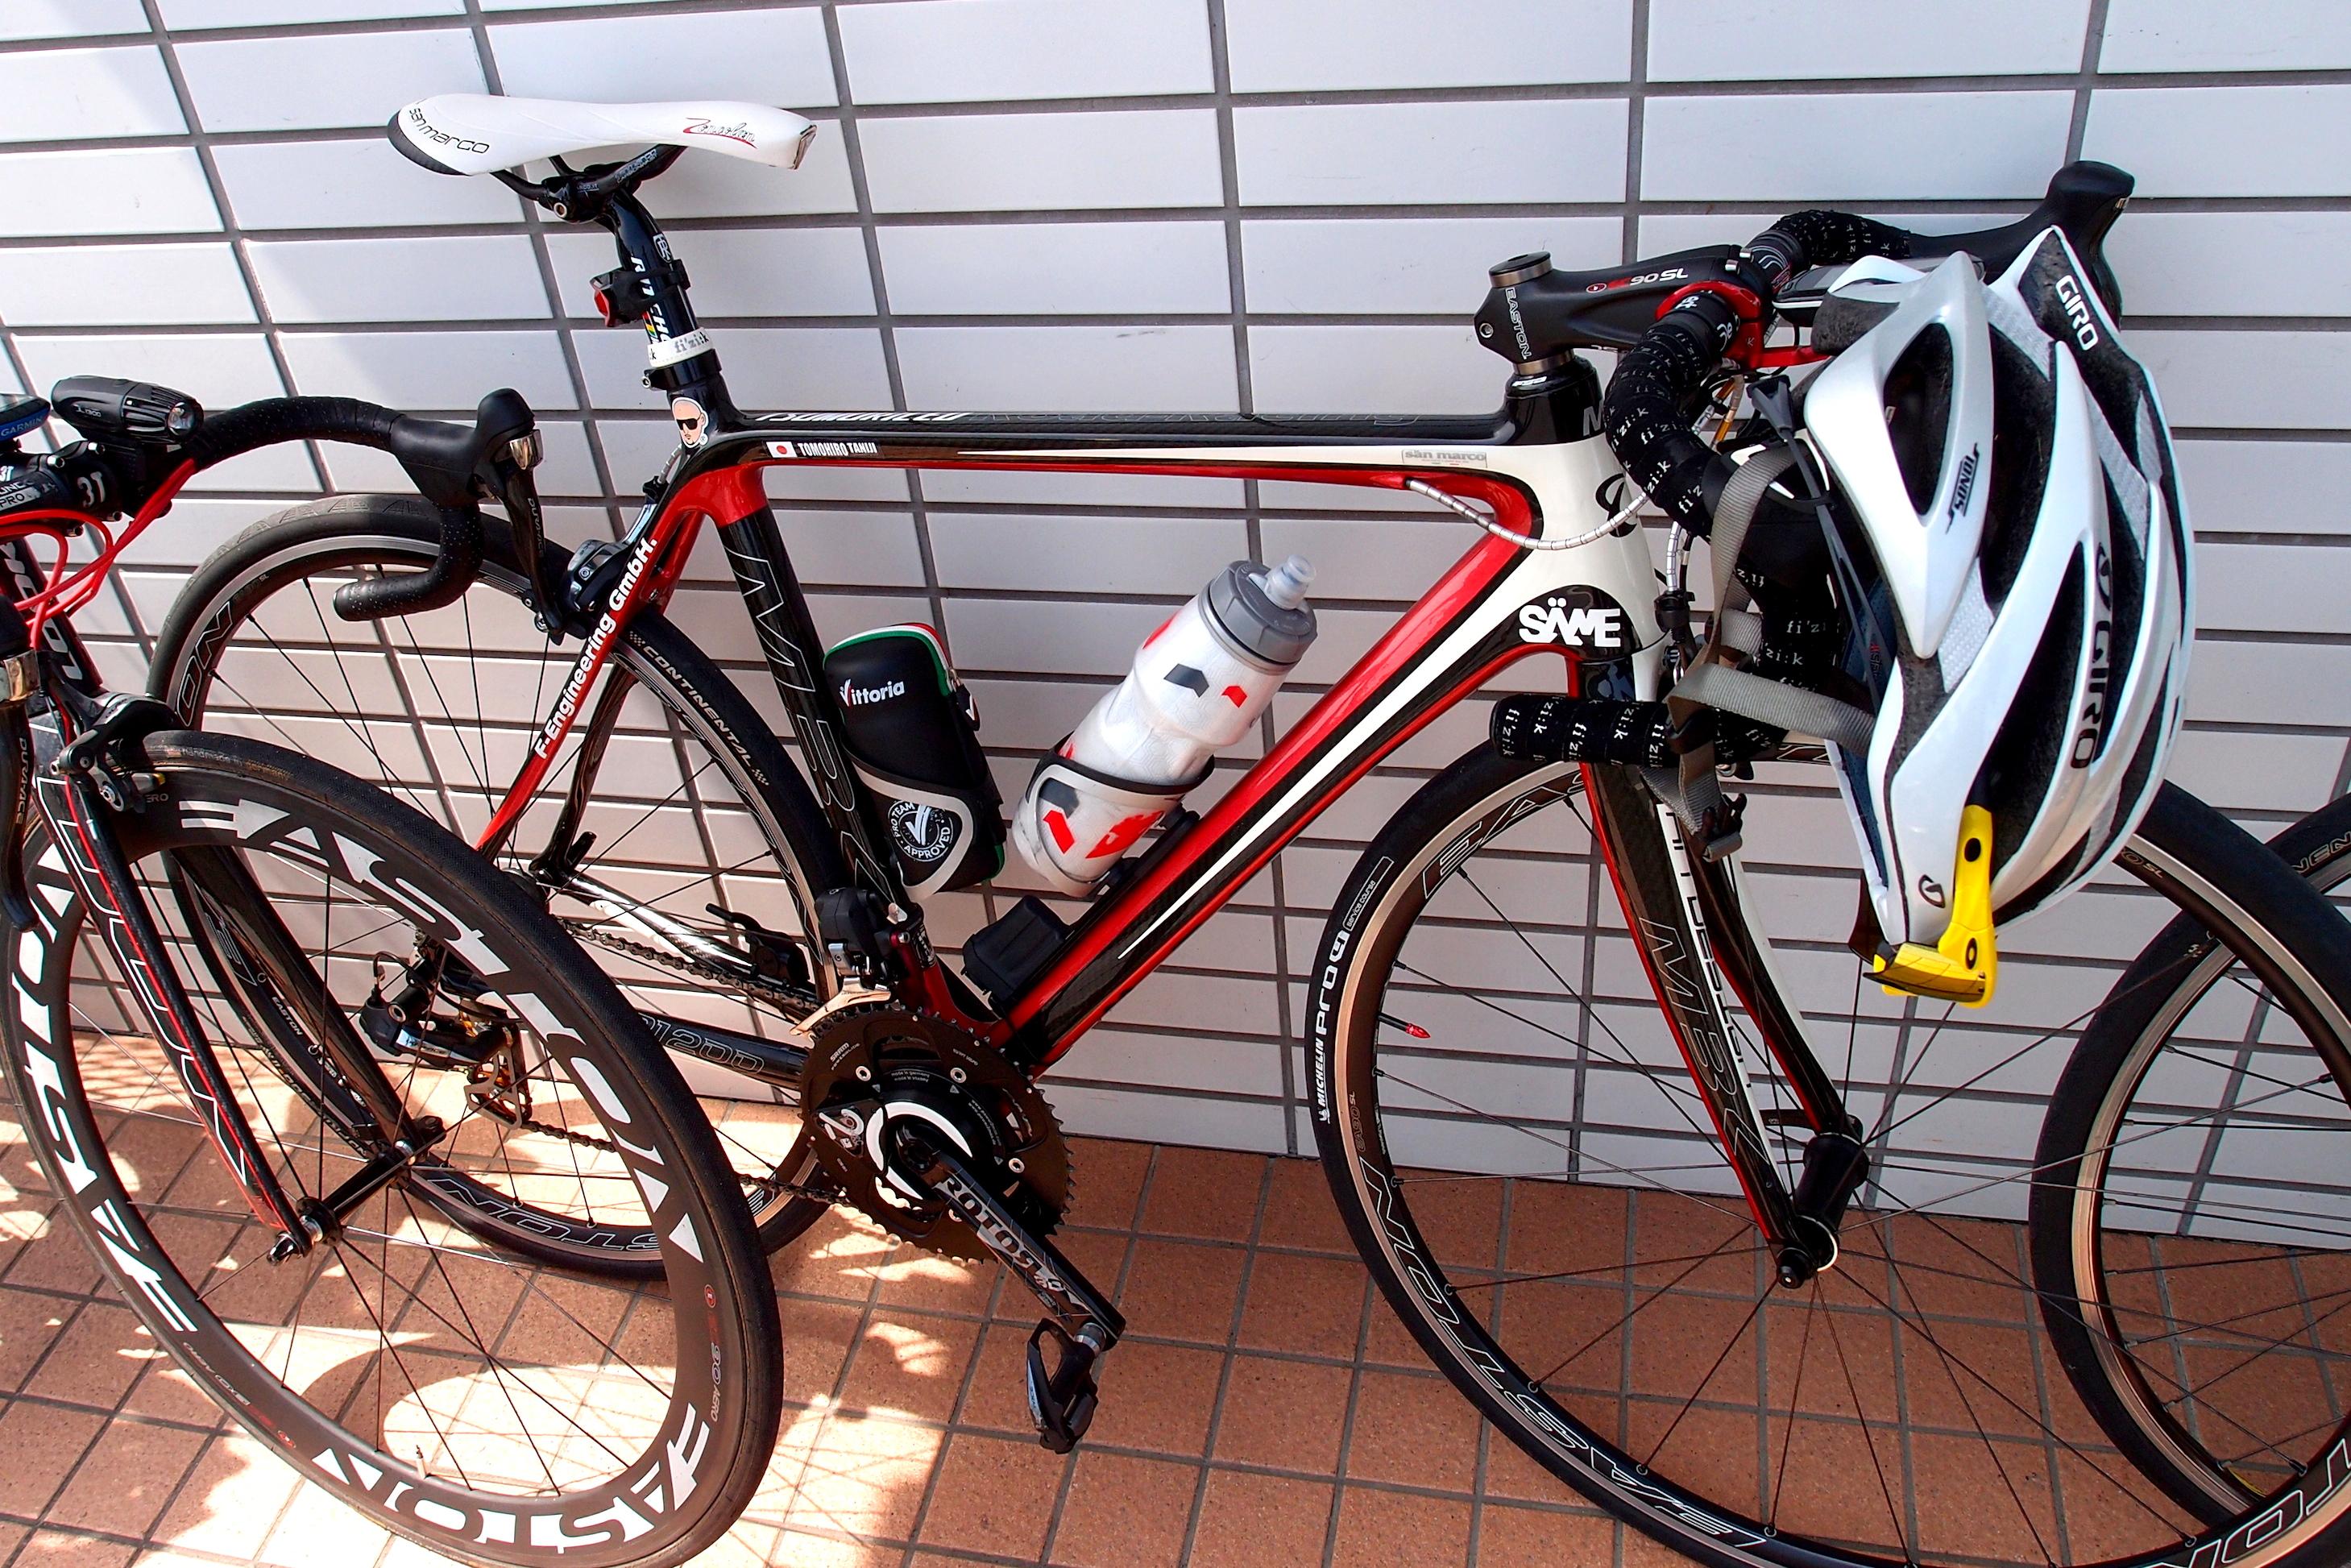 ... 自転車琵琶湖一周オフ ~機材